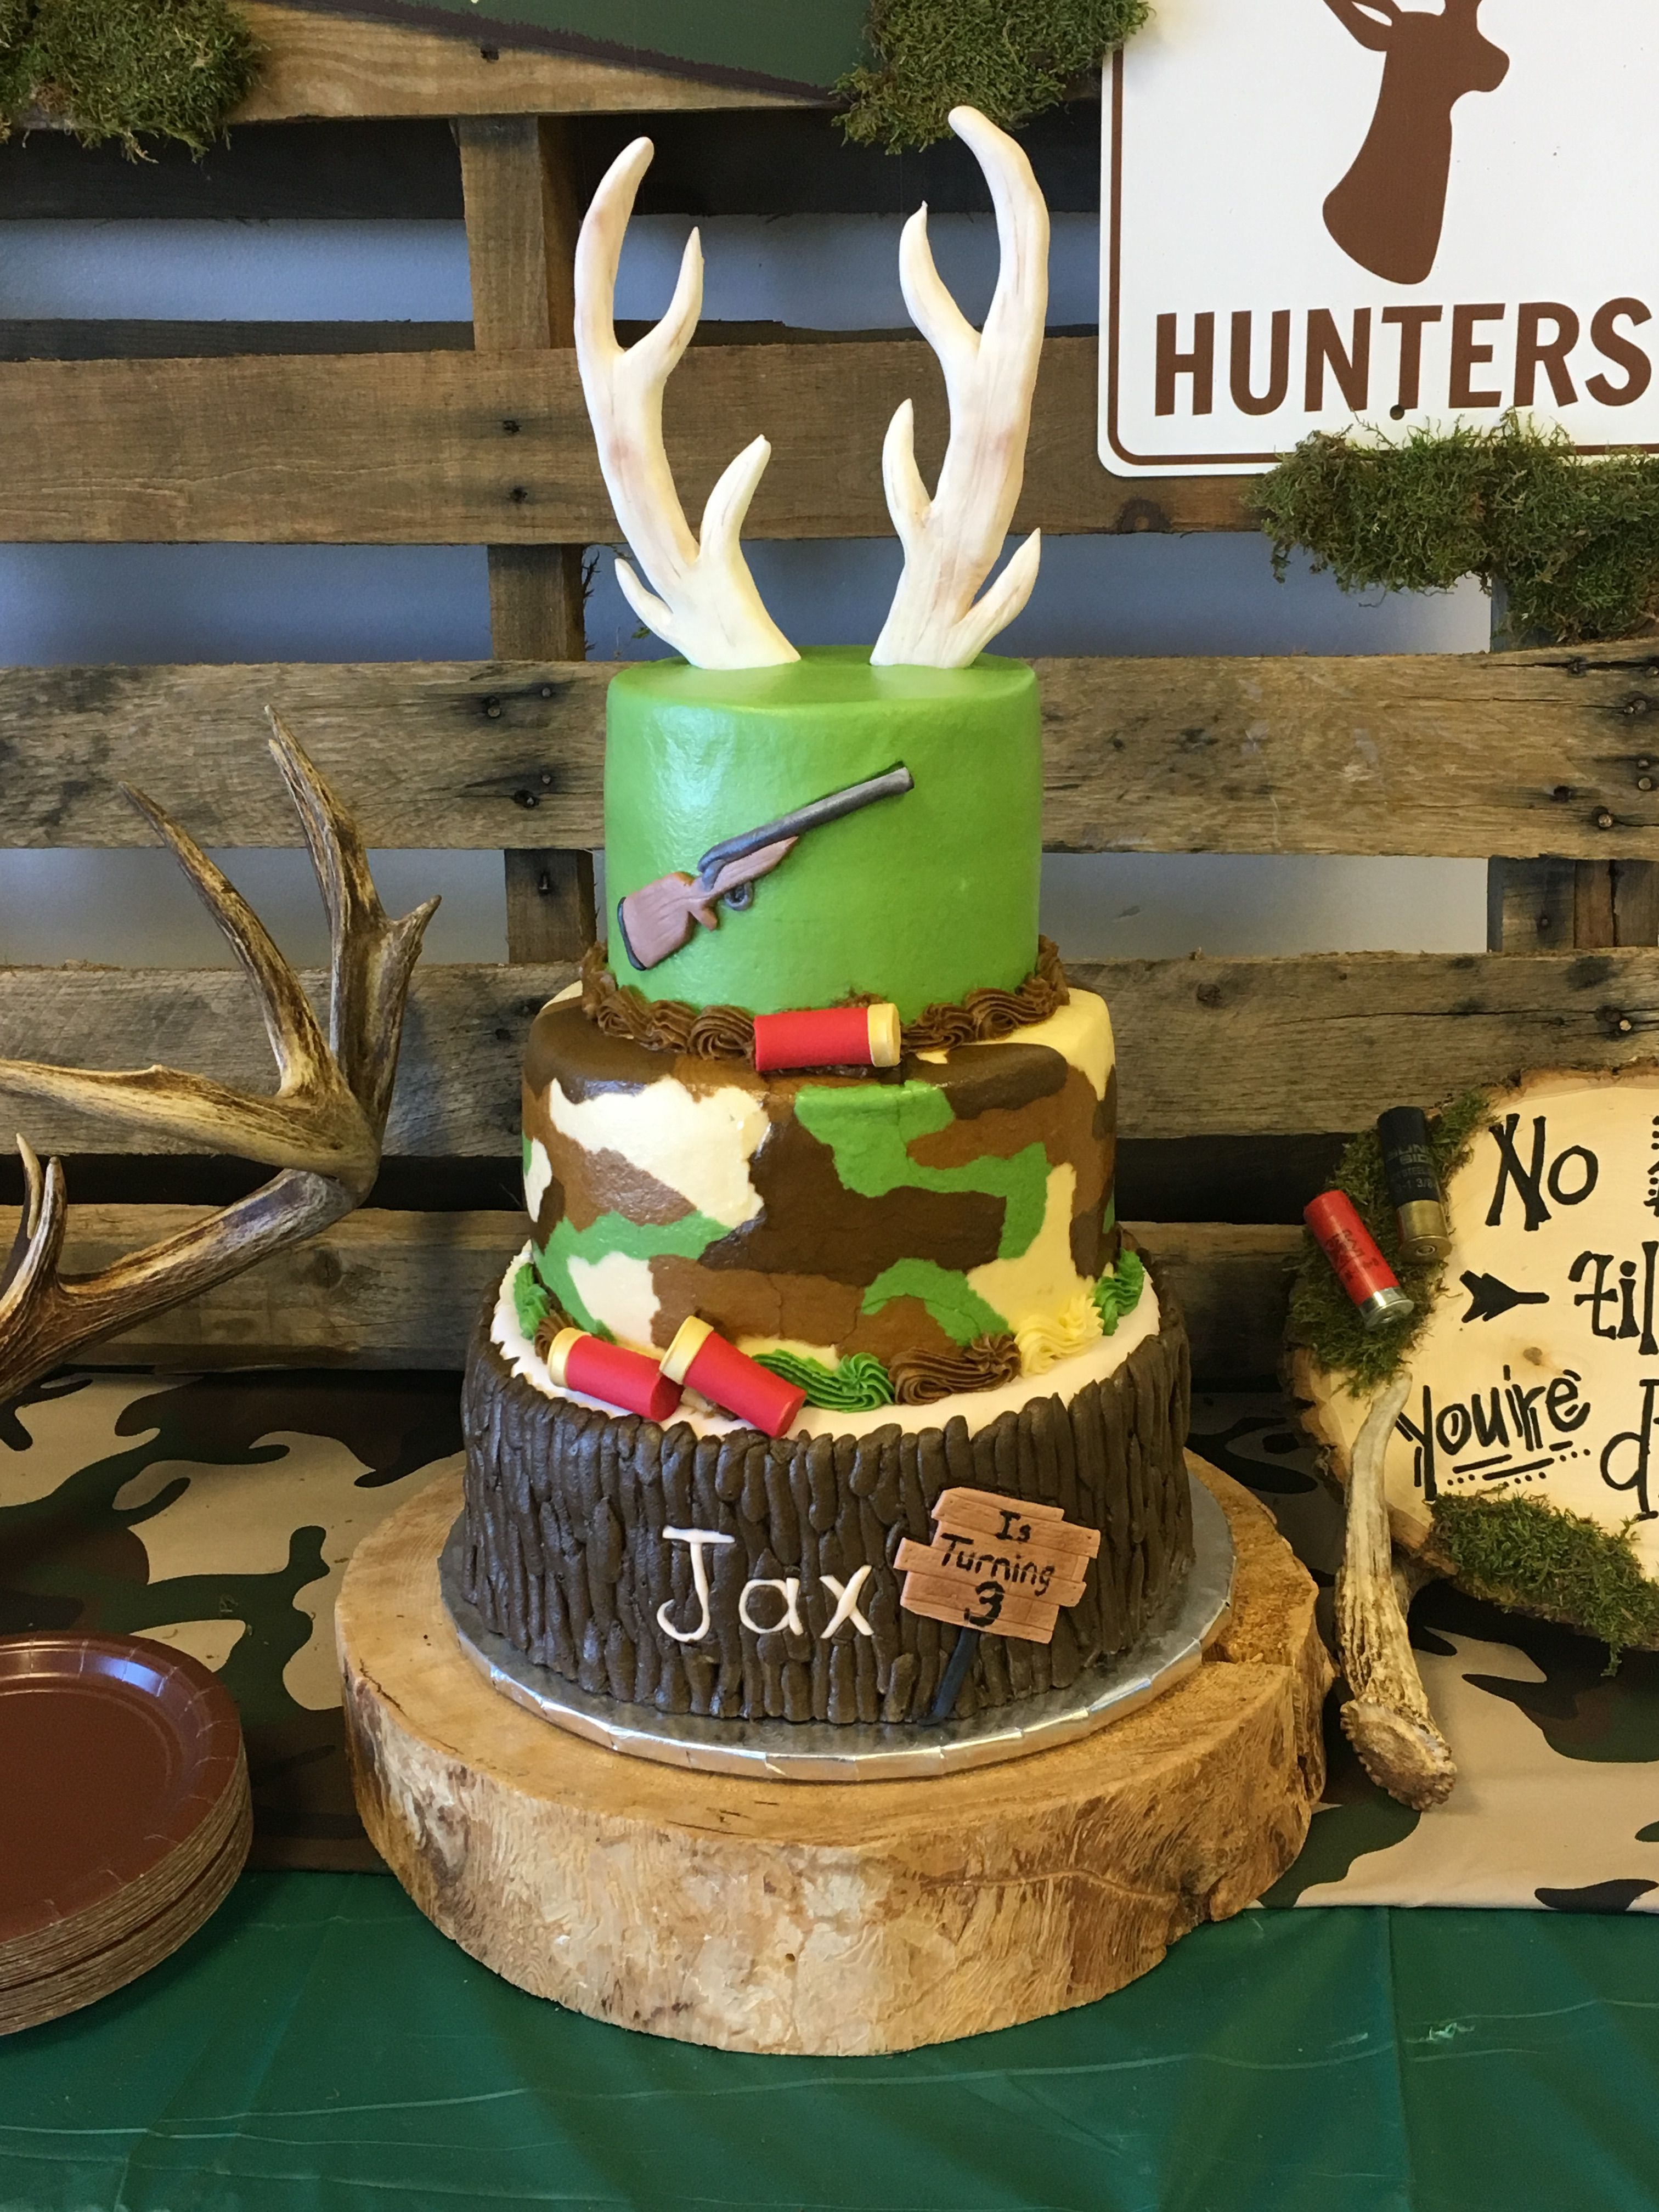 Tremendous Hunting Birthday Party Cake Idea Hunting Birthday Party Personalised Birthday Cards Epsylily Jamesorg